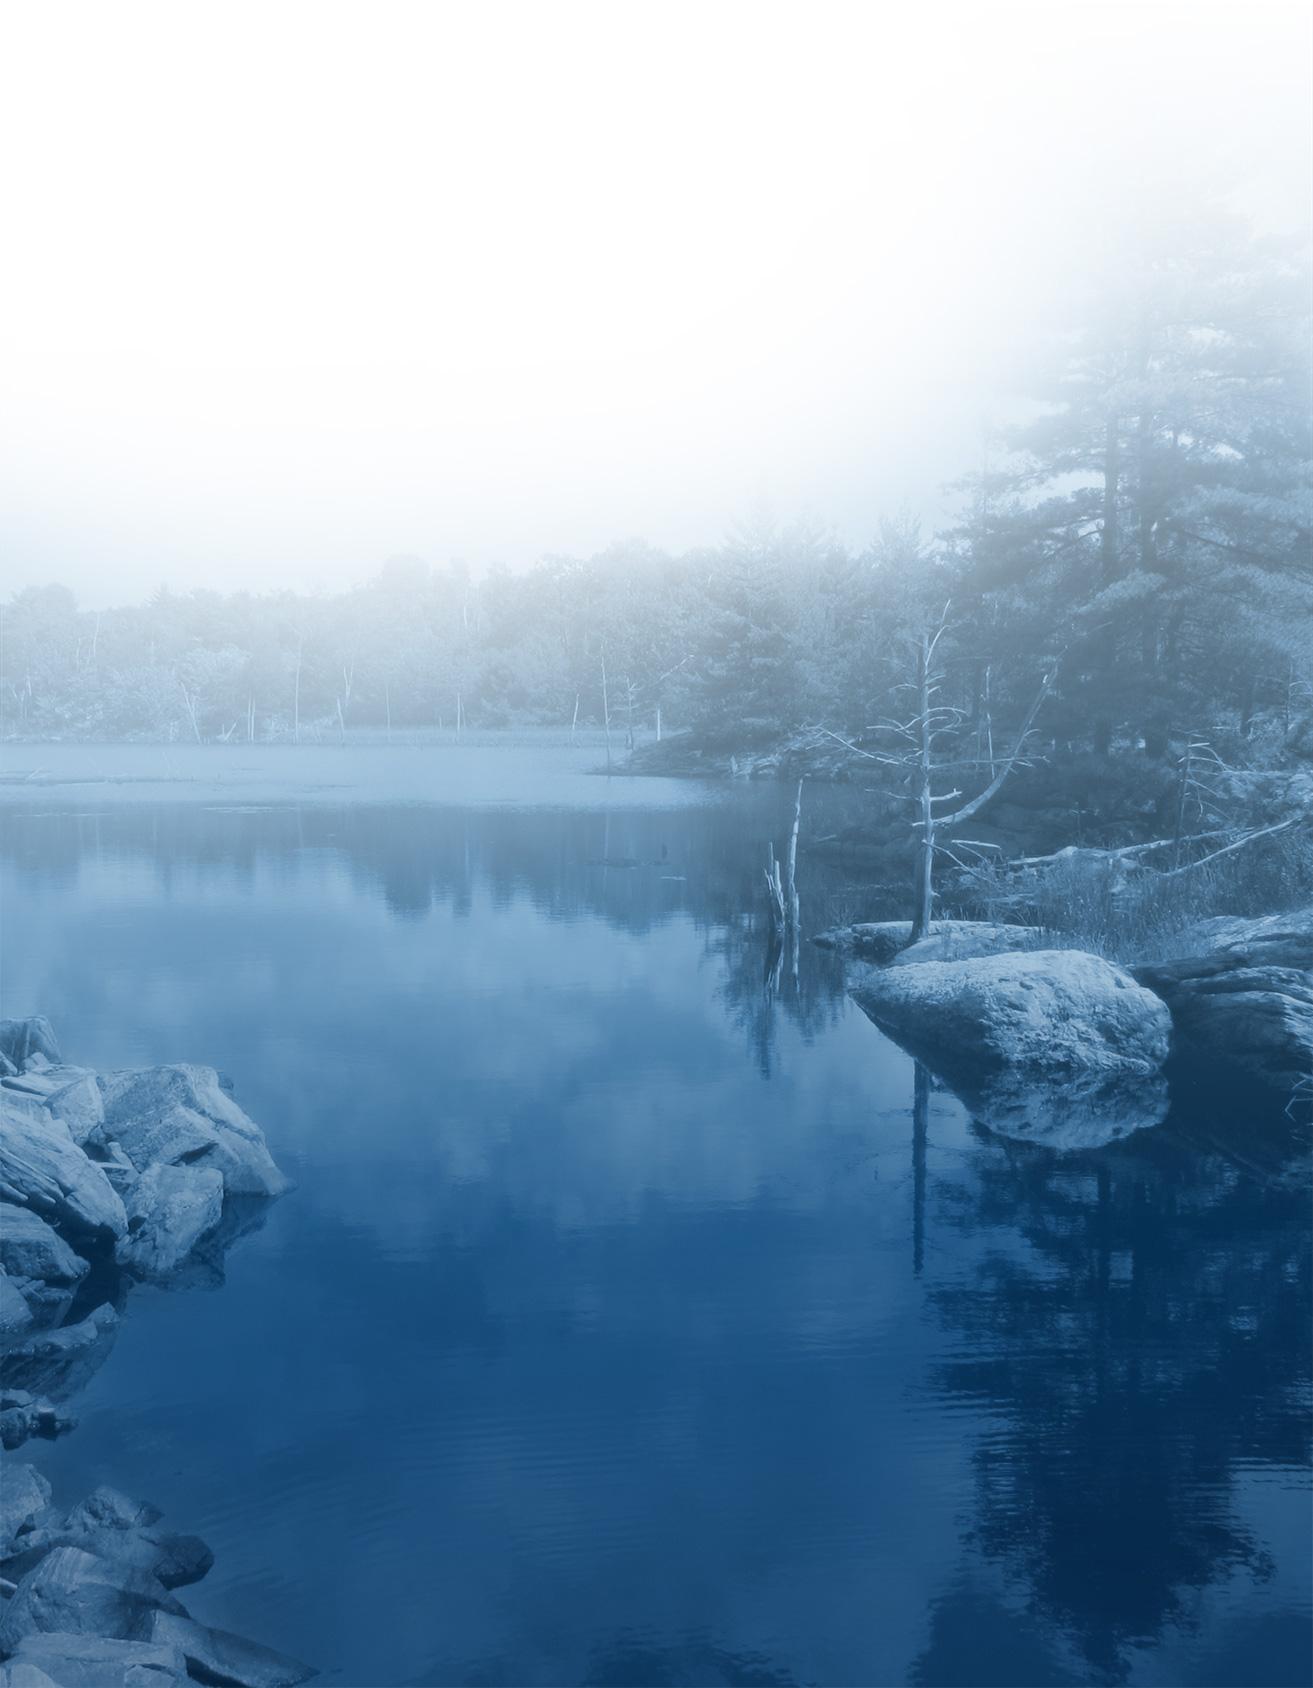 Beacon Environmental - Lake and woods - Blue Duo Tone